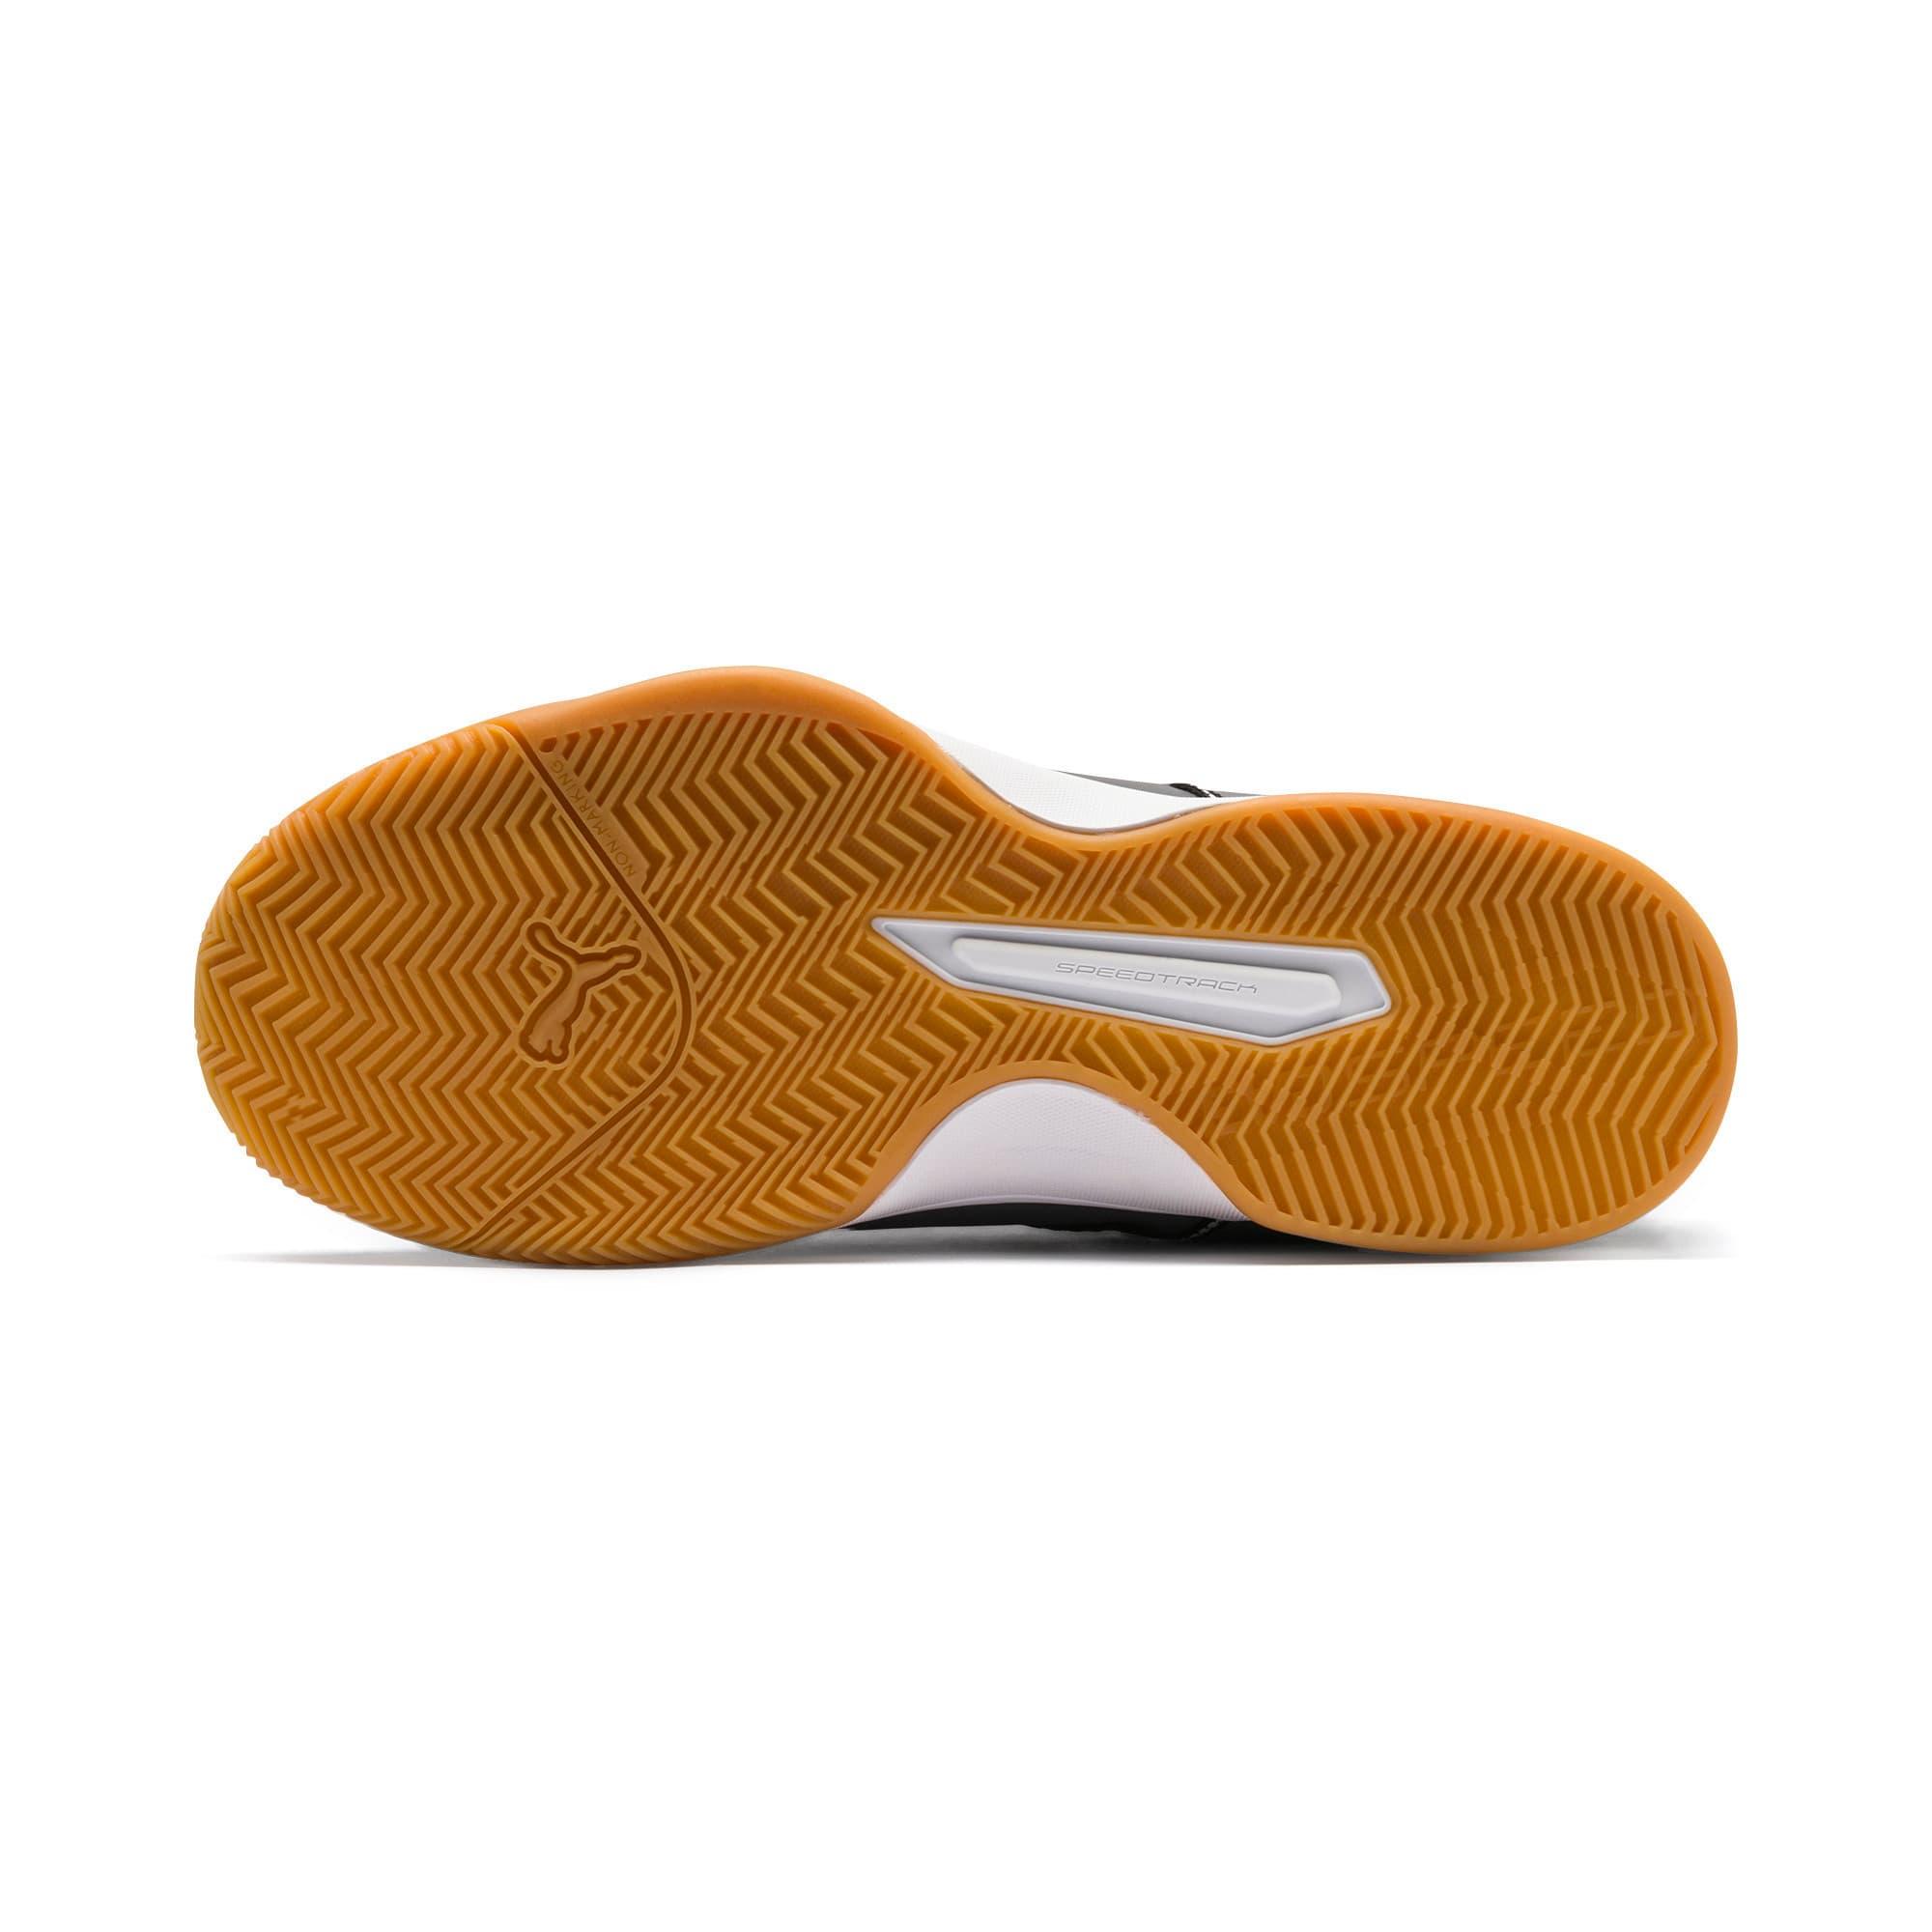 Thumbnail 3 of PUMA Stoker.18 Indoor Training Shoes, Black-White-Iron Gate-Gum, medium-IND